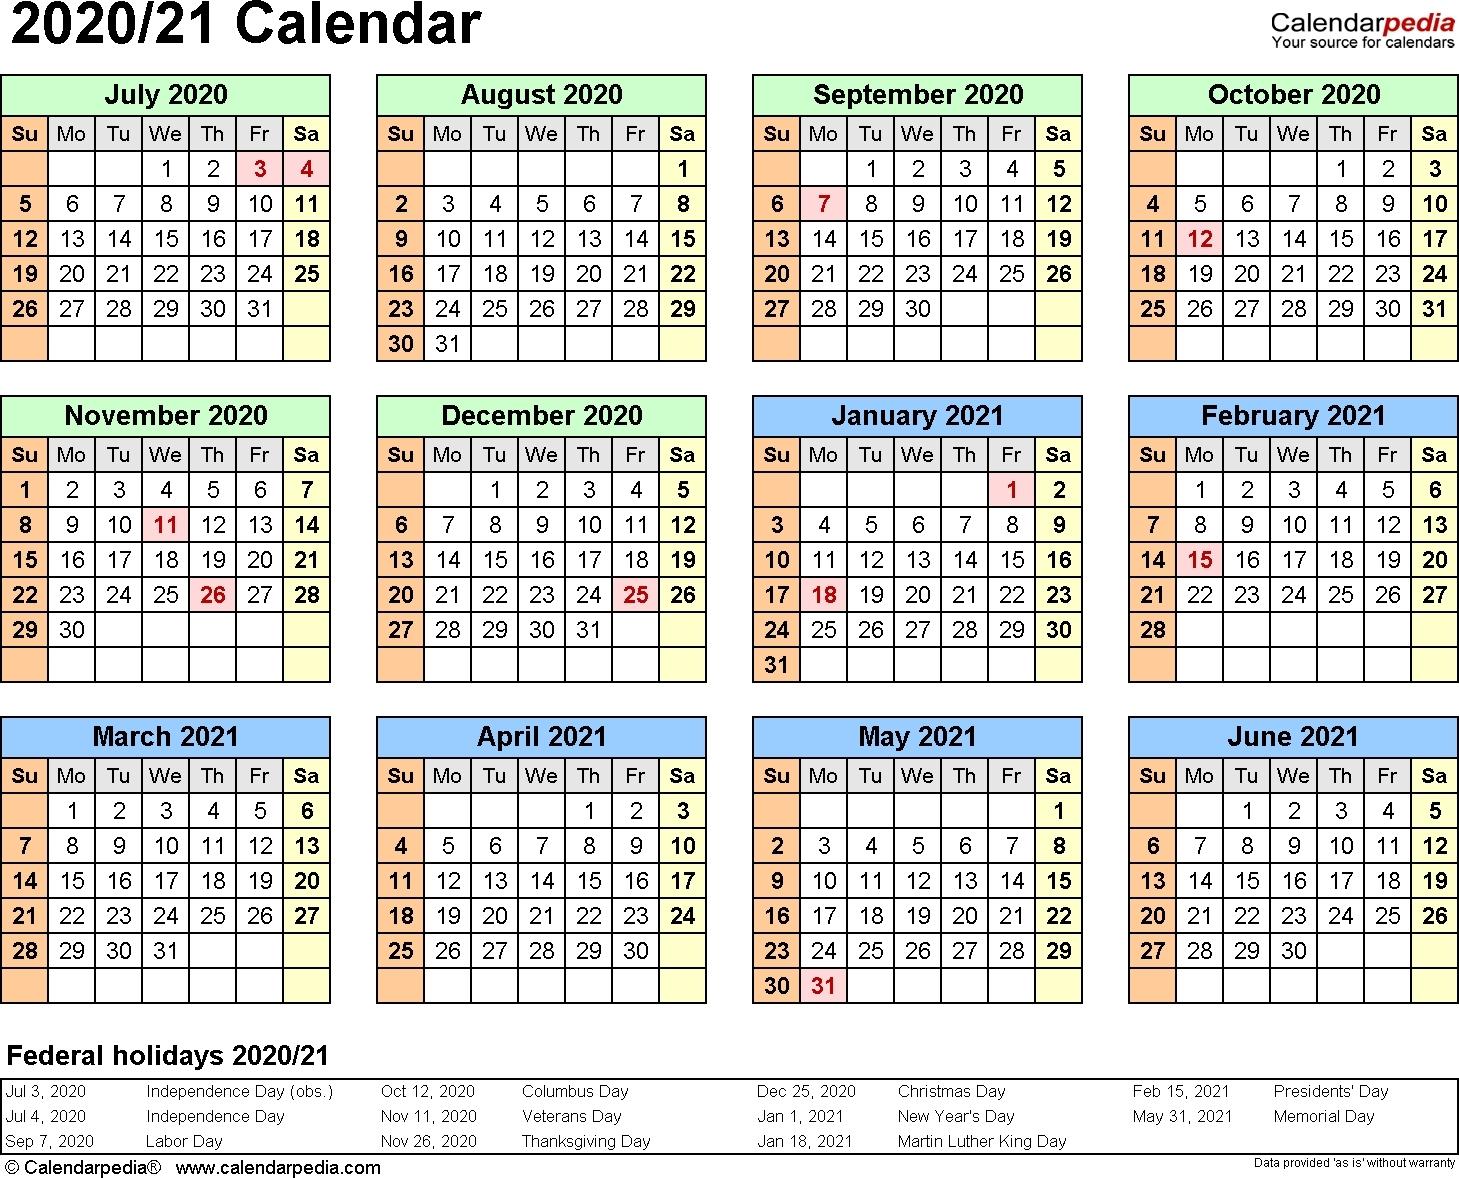 Calendarpedia 2020 Excel | Calendar For Planning  Calendar 18/19 Financial Year Australia